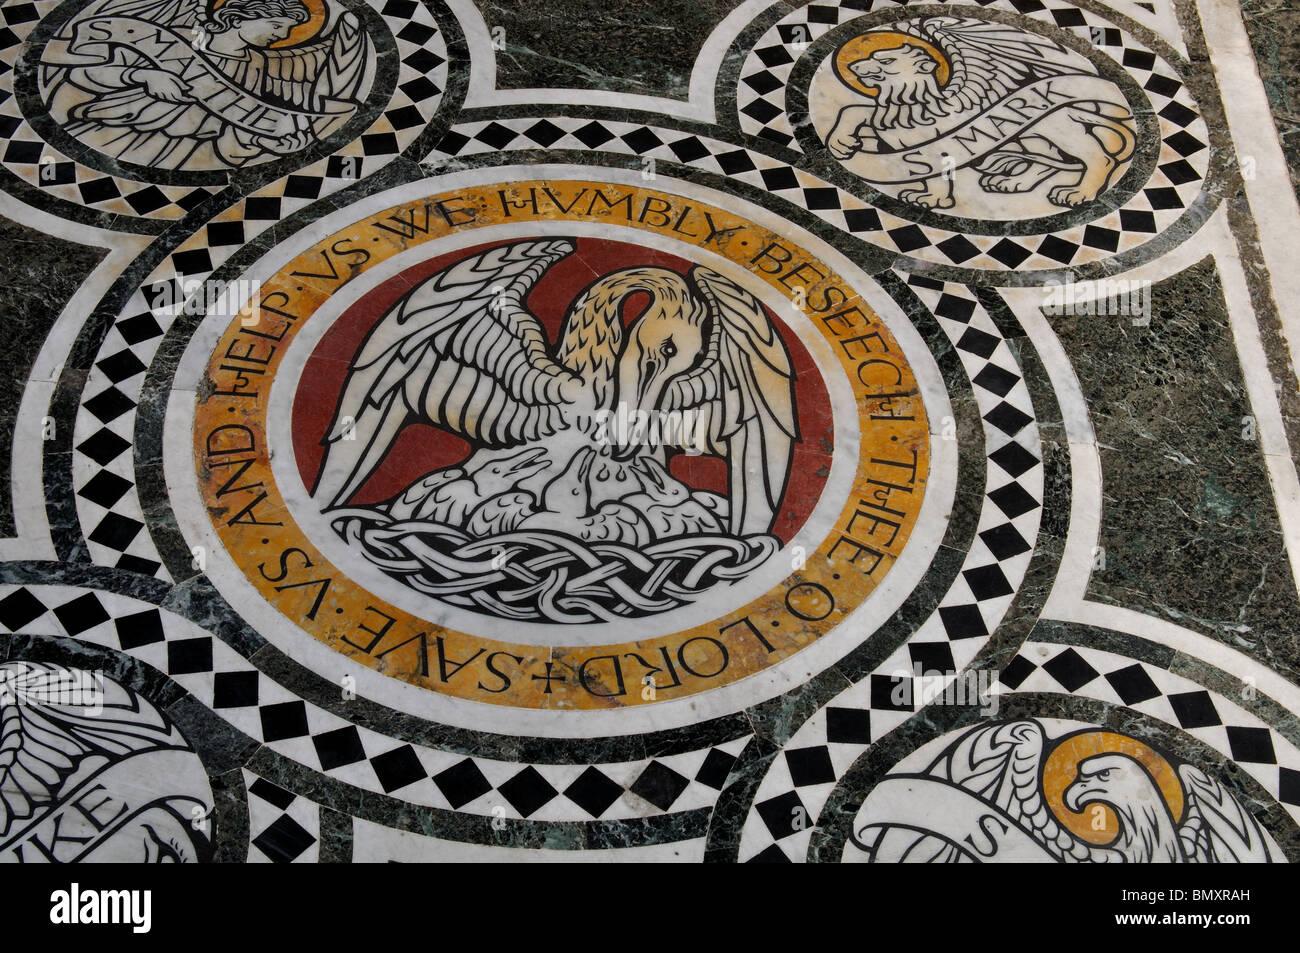 Detail of chancel floor, All Saints Church, Northampton, Northamptonshire, England, UK - Stock Image